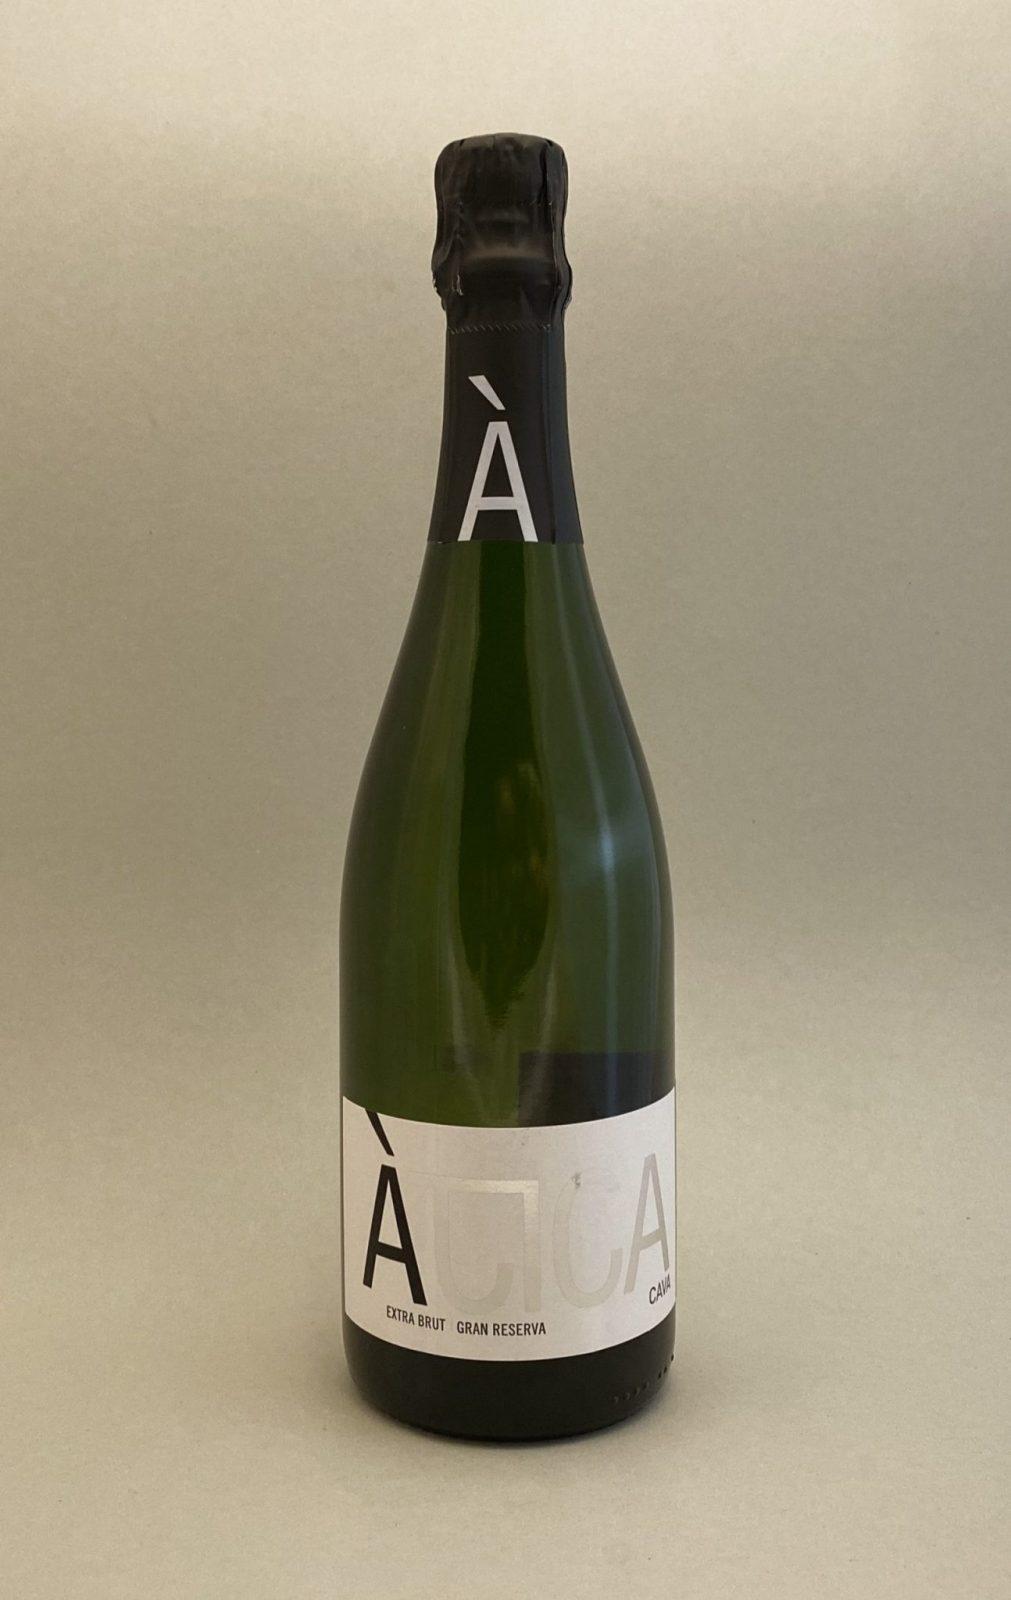 ÀTICA Gran Reserva 2014 Cava Extra Brut, Bulbinkove vino, vinotéka Bratislava Slnecnice, Sunnywines, rozvoz vina, winebar